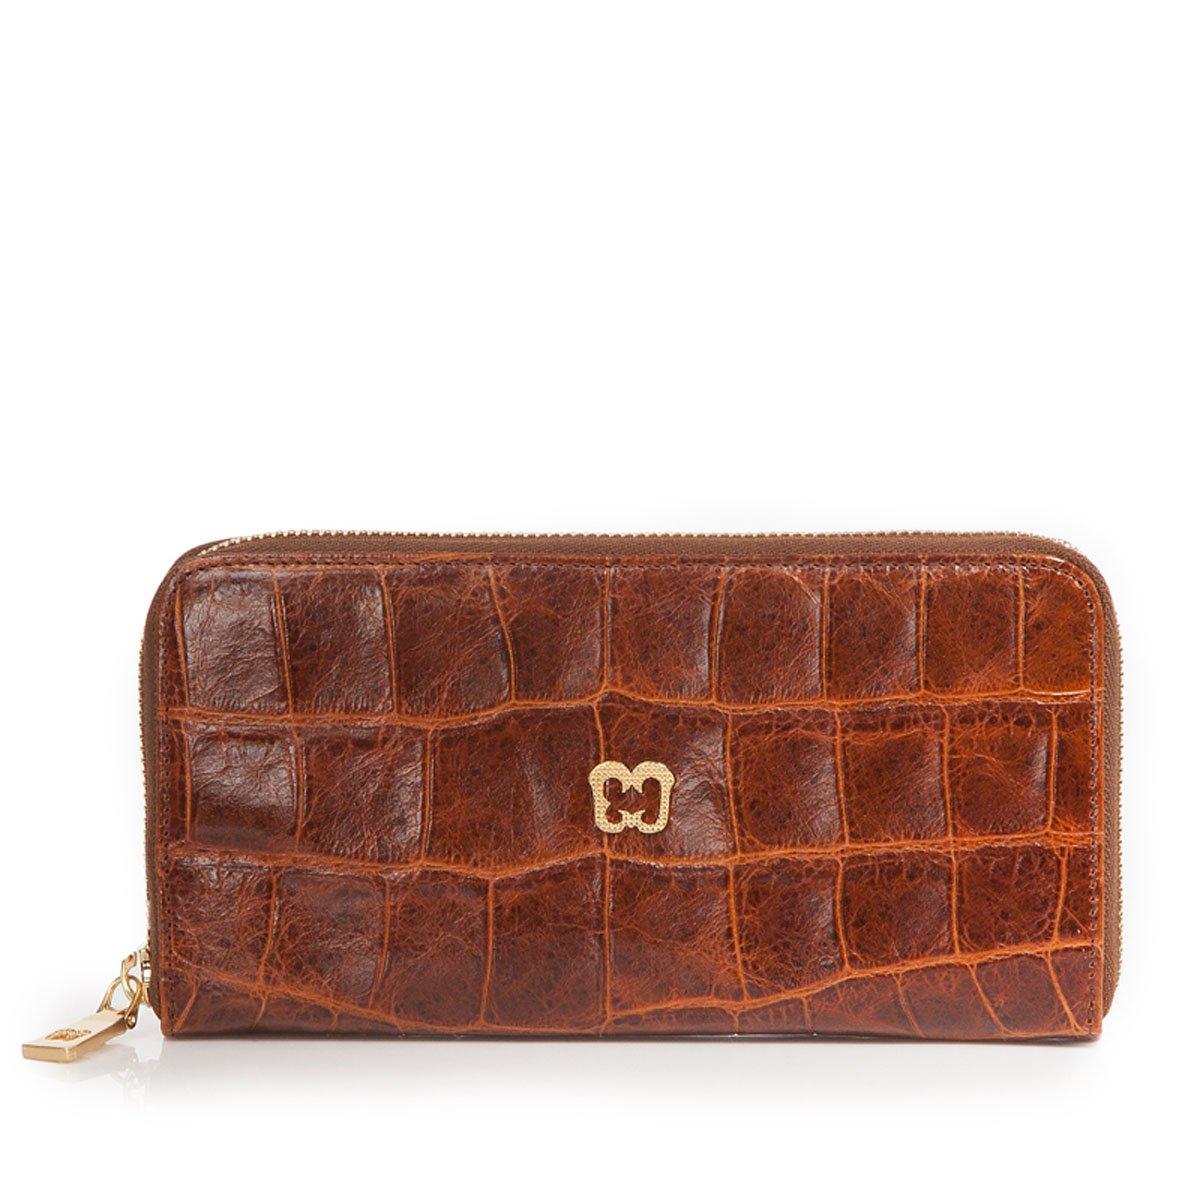 Eric Javits Luxury Fashion Designer Women's Handbag - Zip Wallet - Burnt